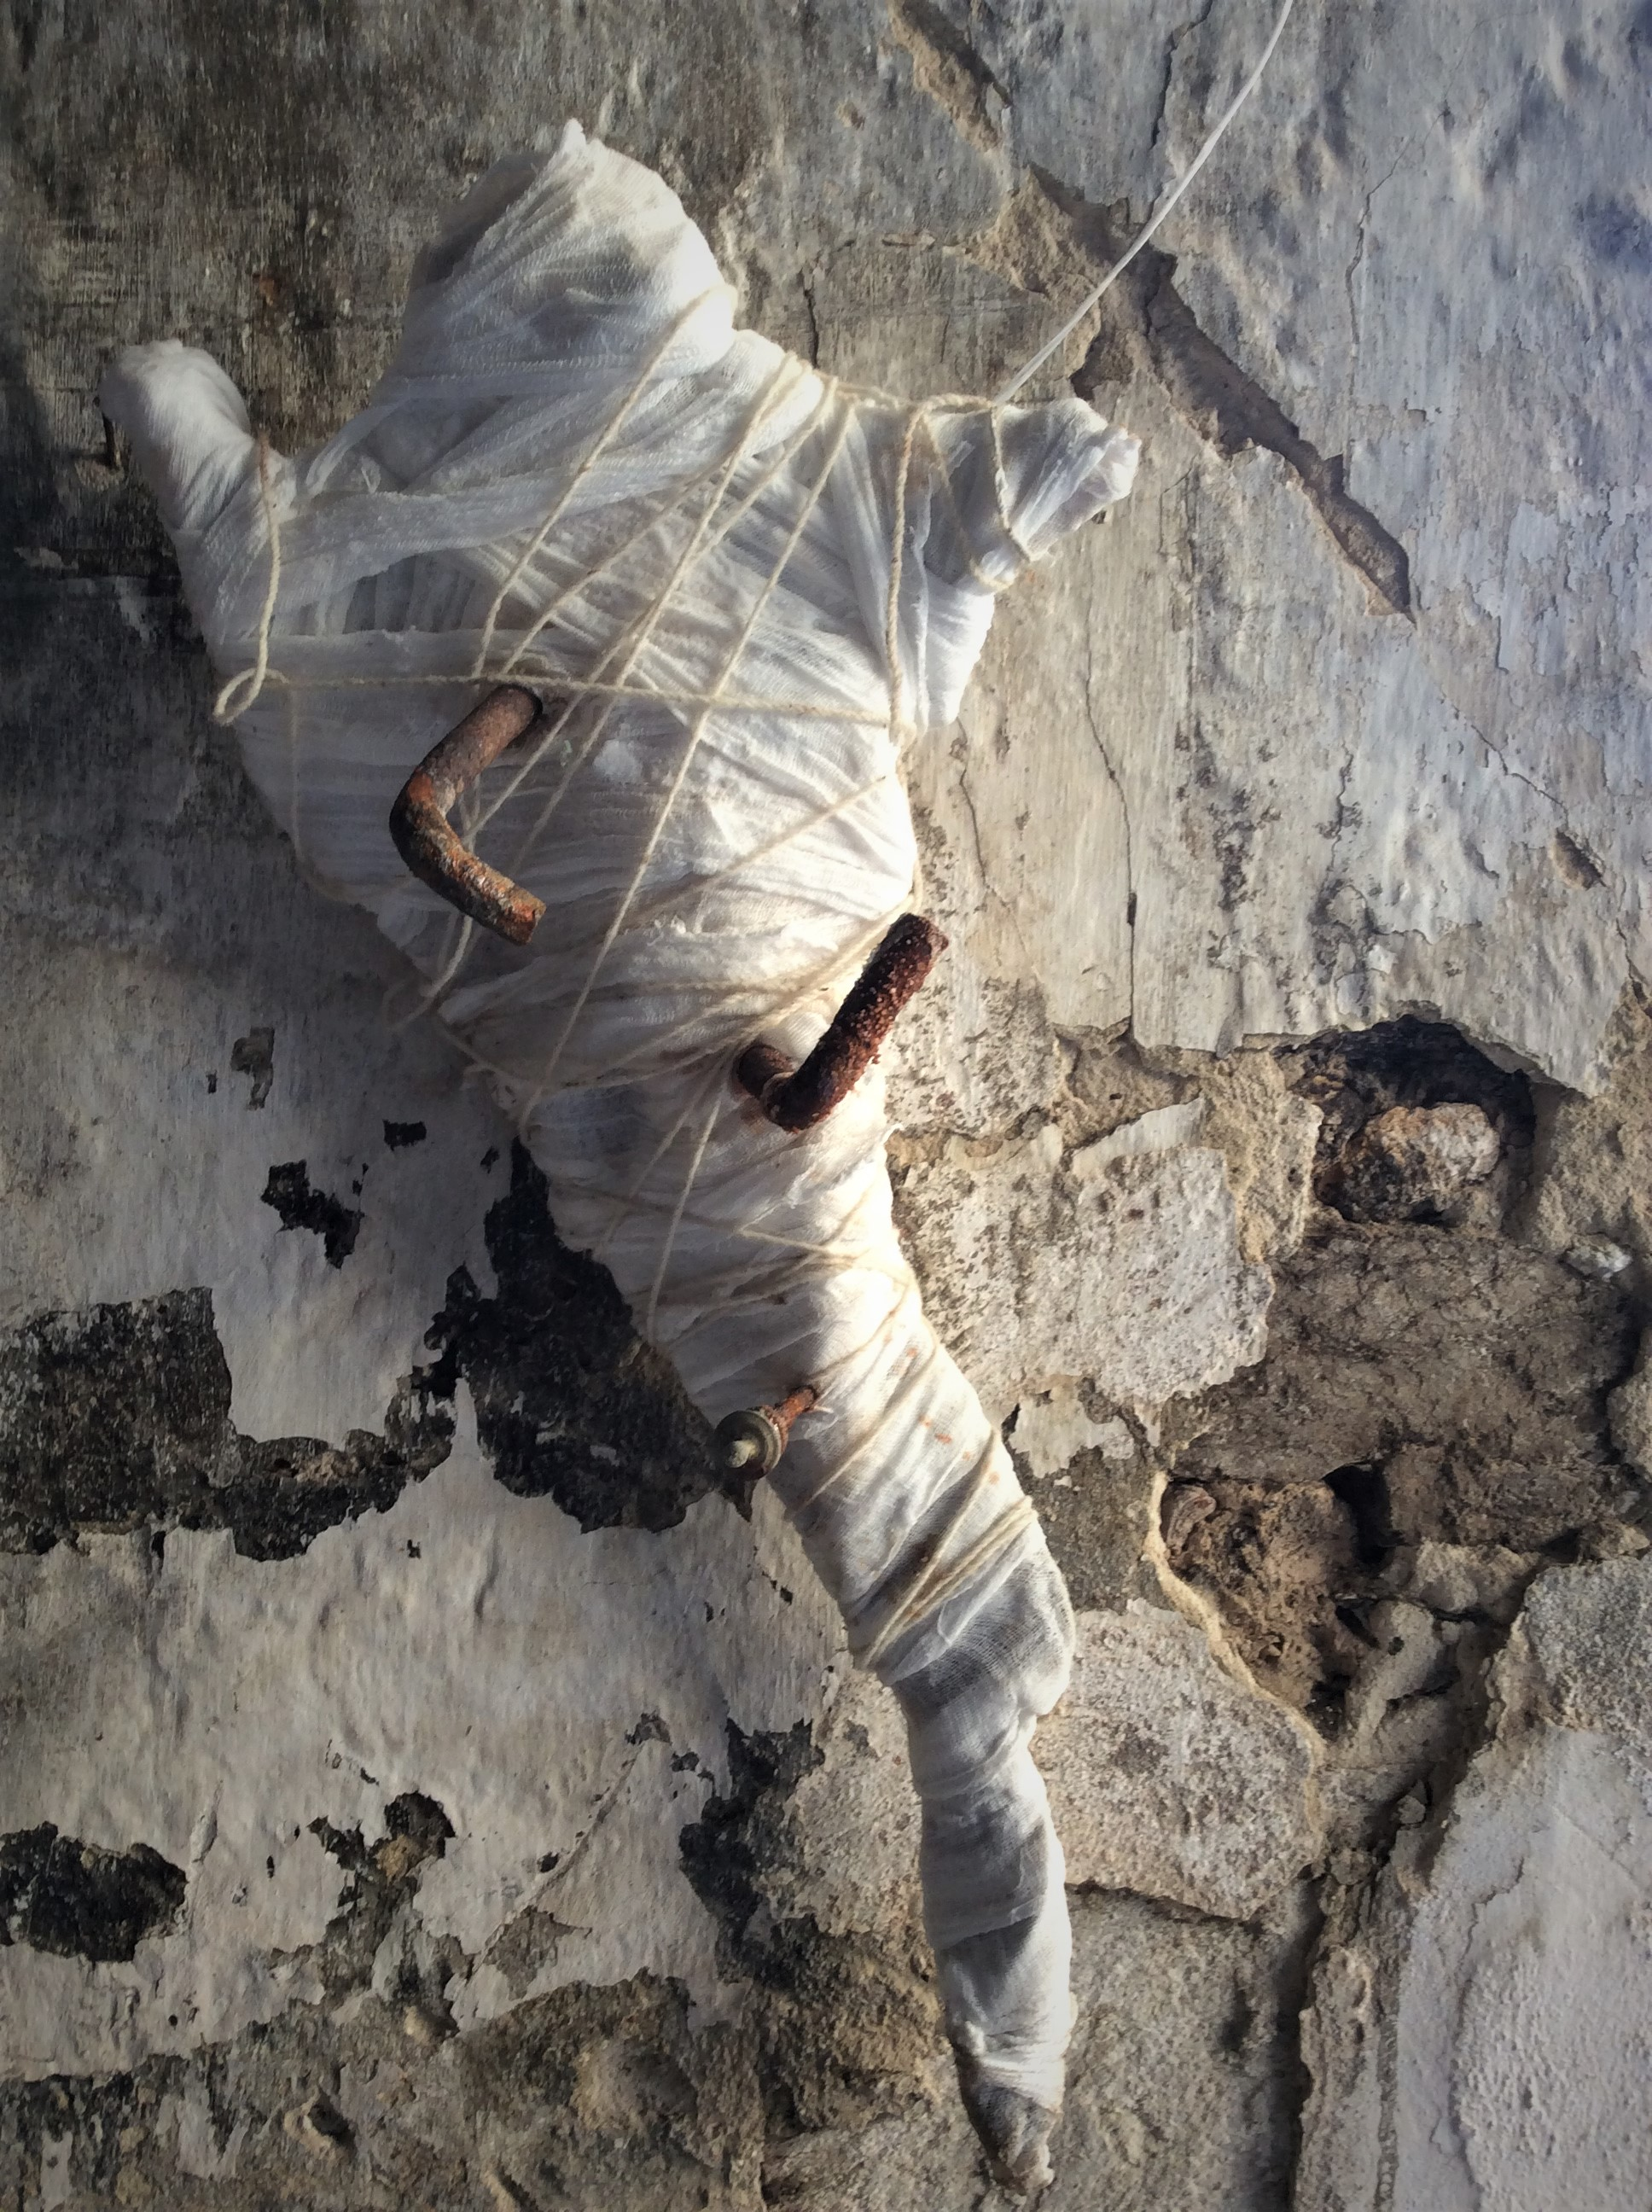 2. Untitled, 2017, Salt, muslin, string, iron, iron flakes, dimensions 84cm x 42cm Image Gail Hocking.JPG